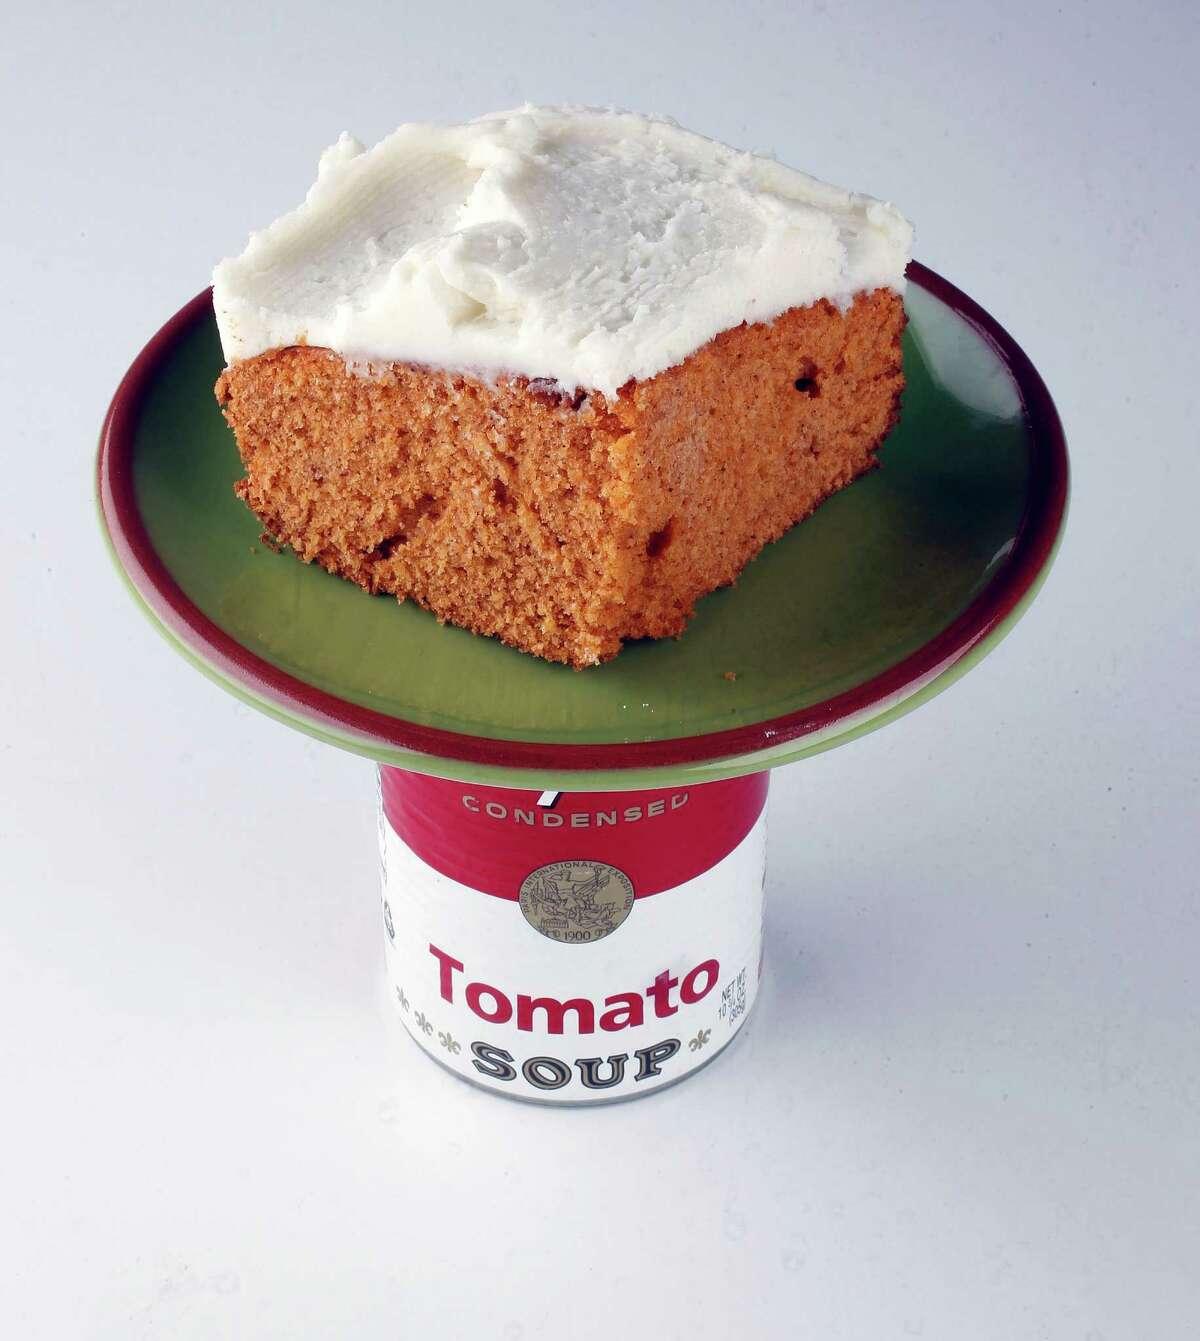 Tomato soup cake Thursday, April 5, 2012, in Houston. ( James Nielsen / Chronicle )